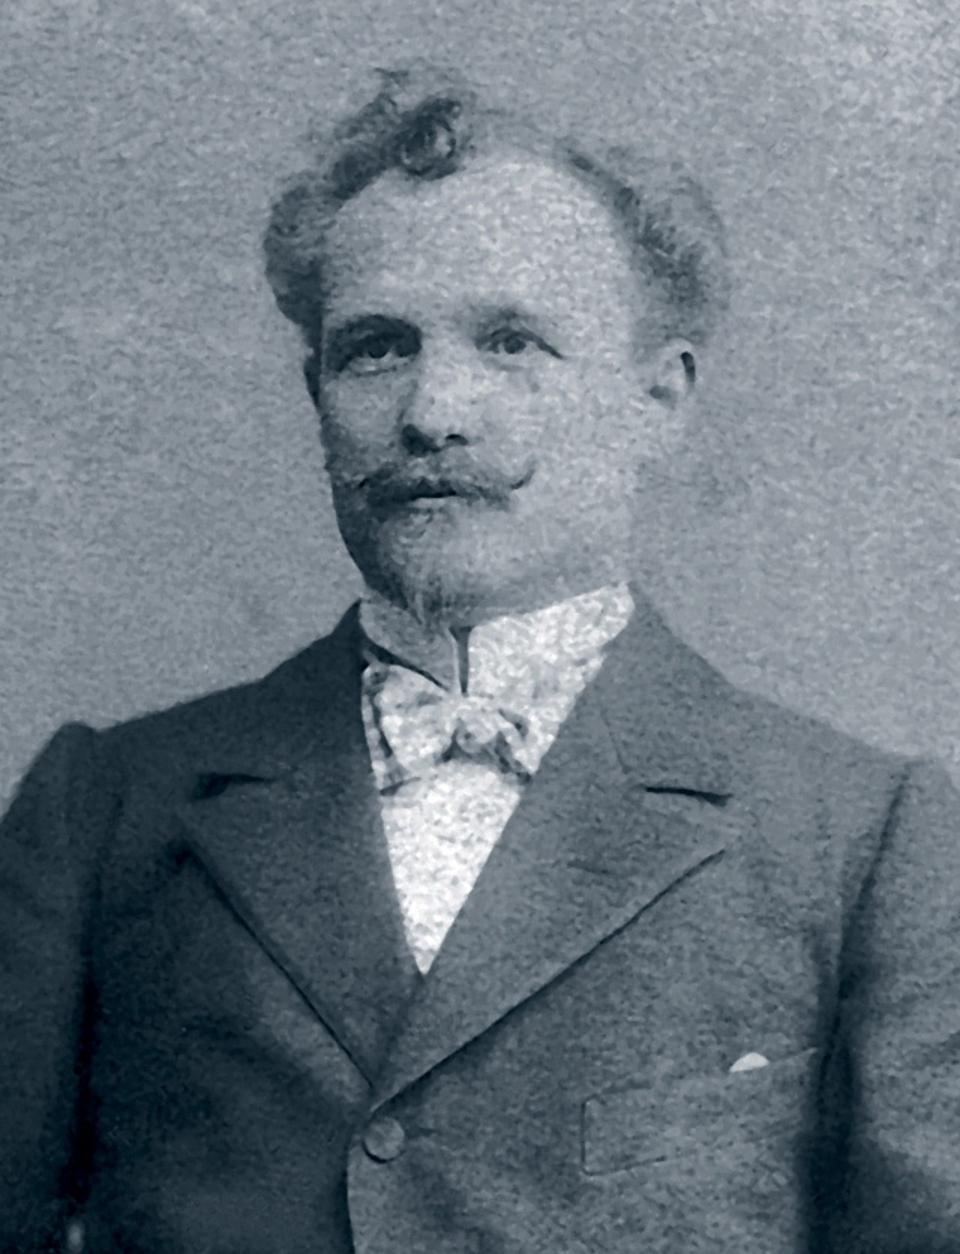 The founder of Breitling, Léon Breitling.